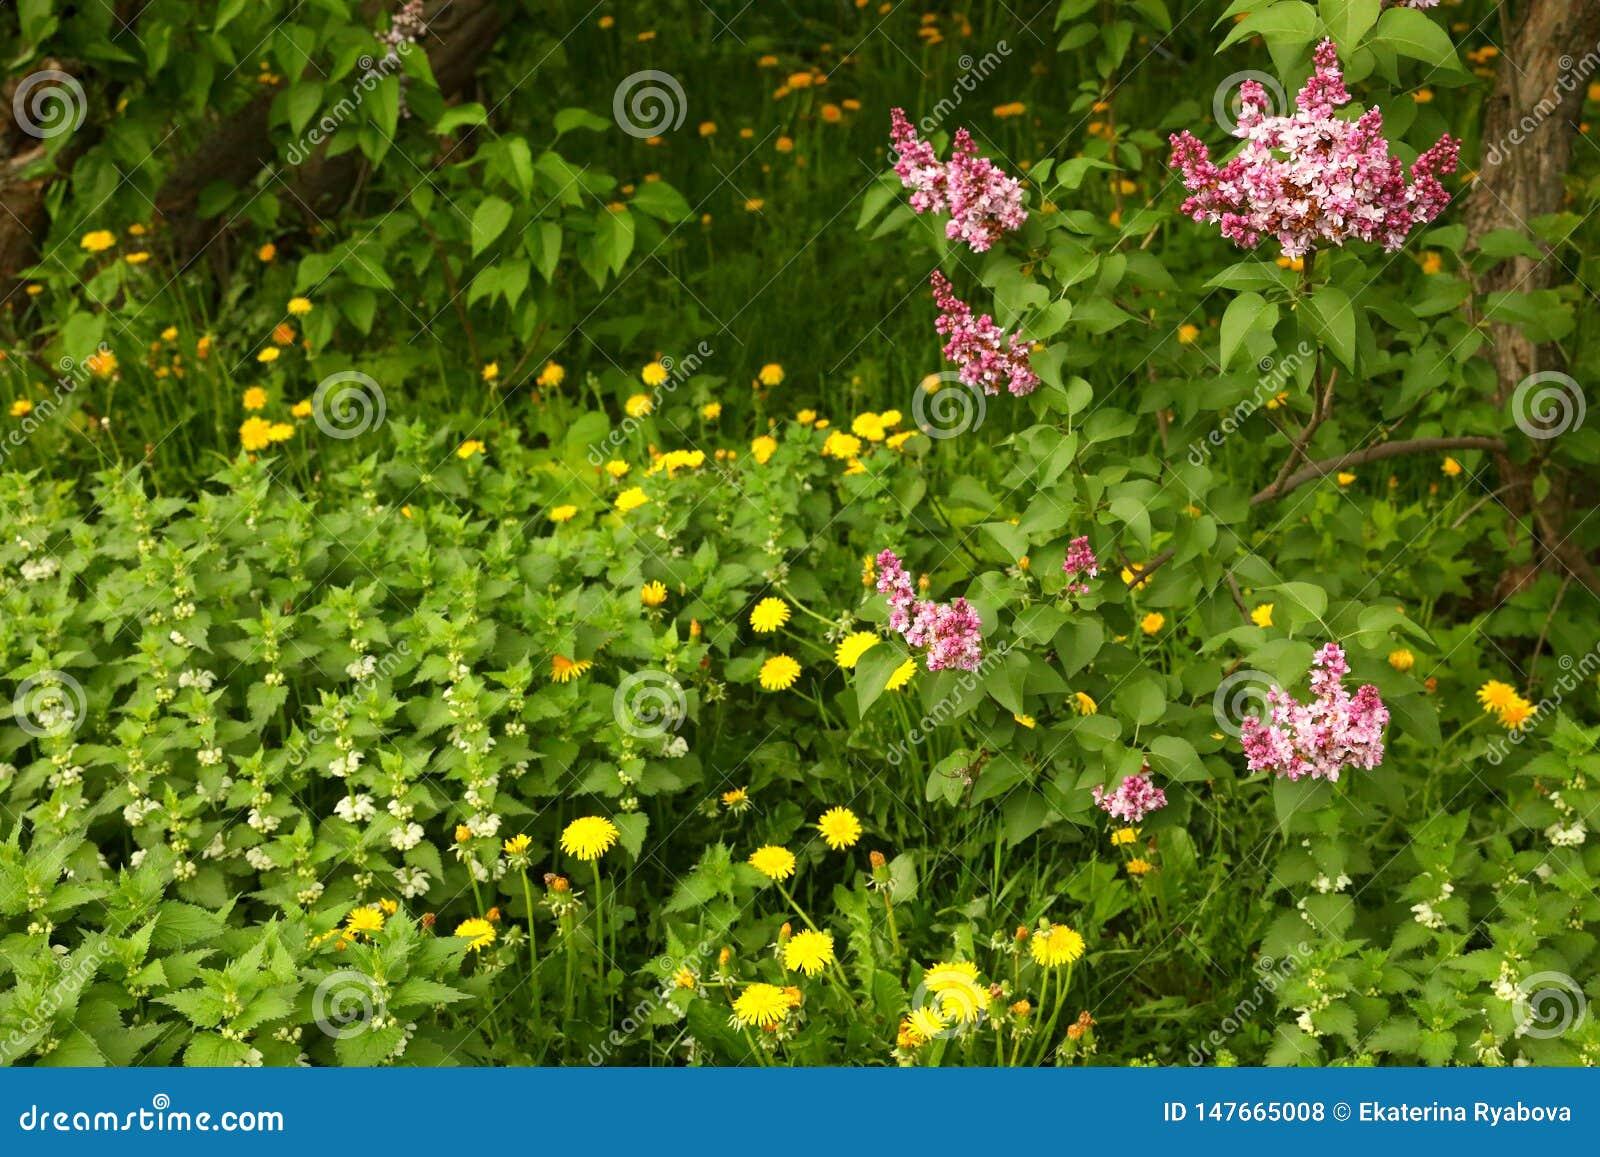 Lavender lilac bushes, dandelions and white dead nettle